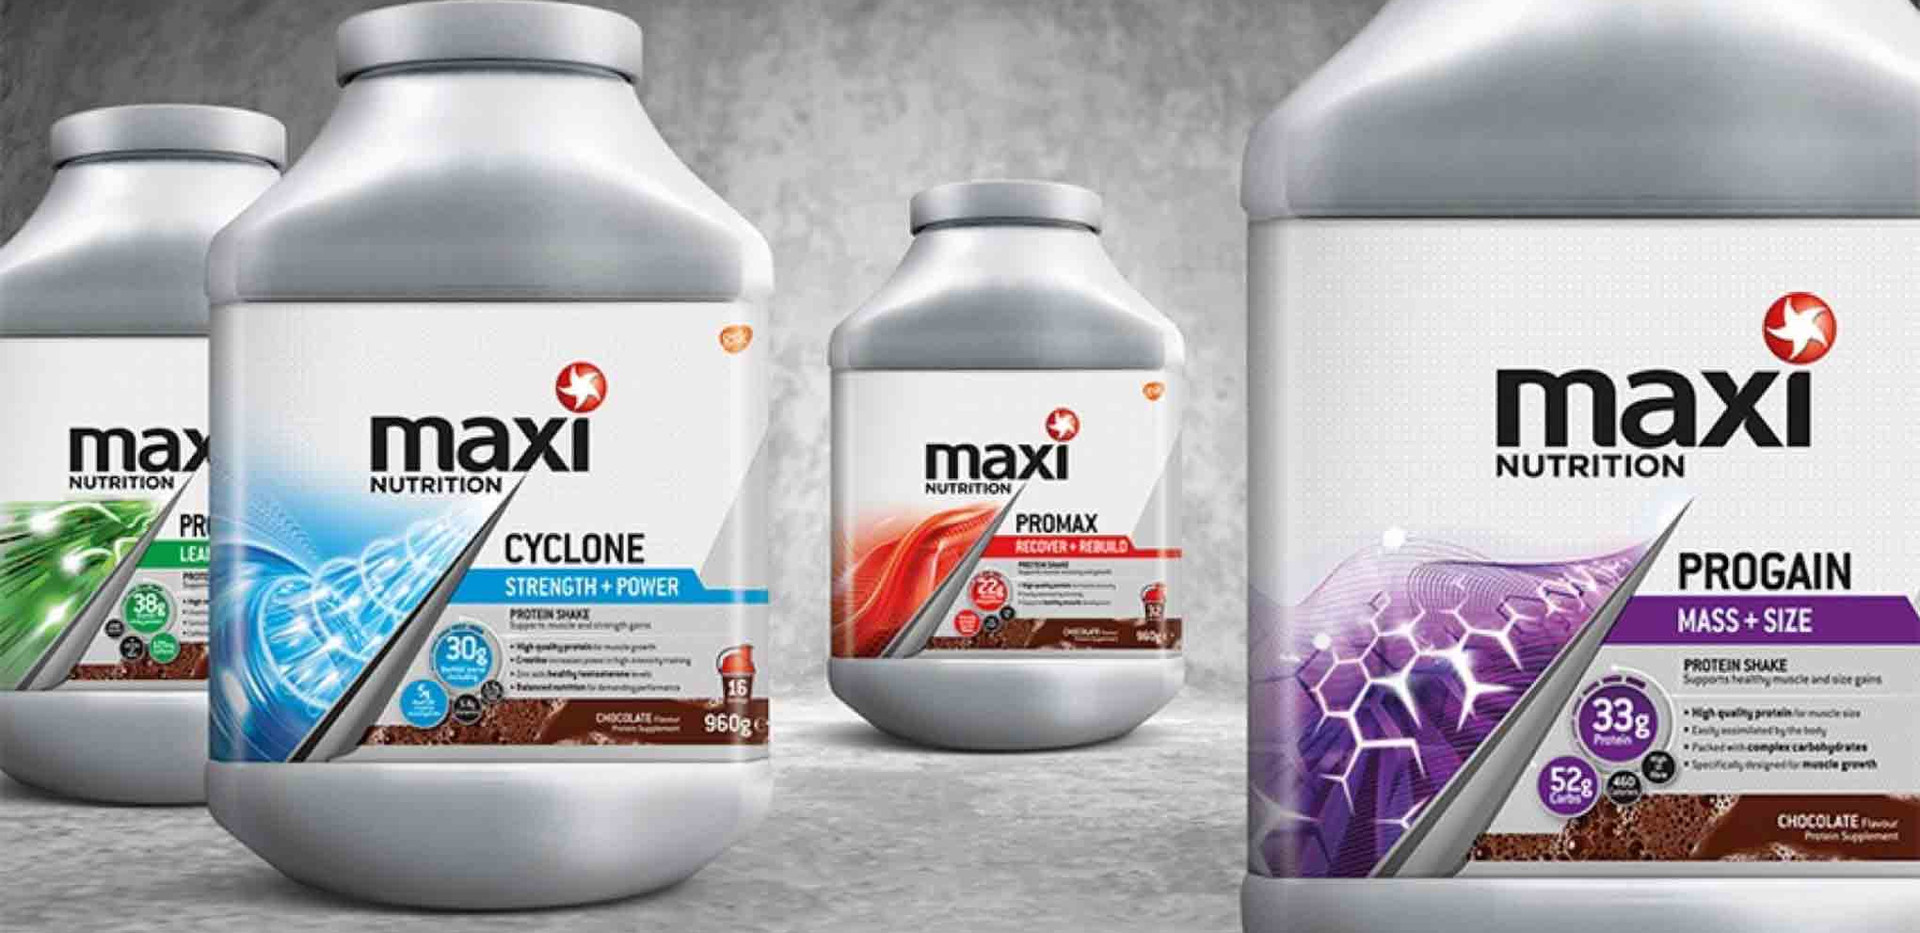 Play_Retail_Design_Maxi_Case_Study